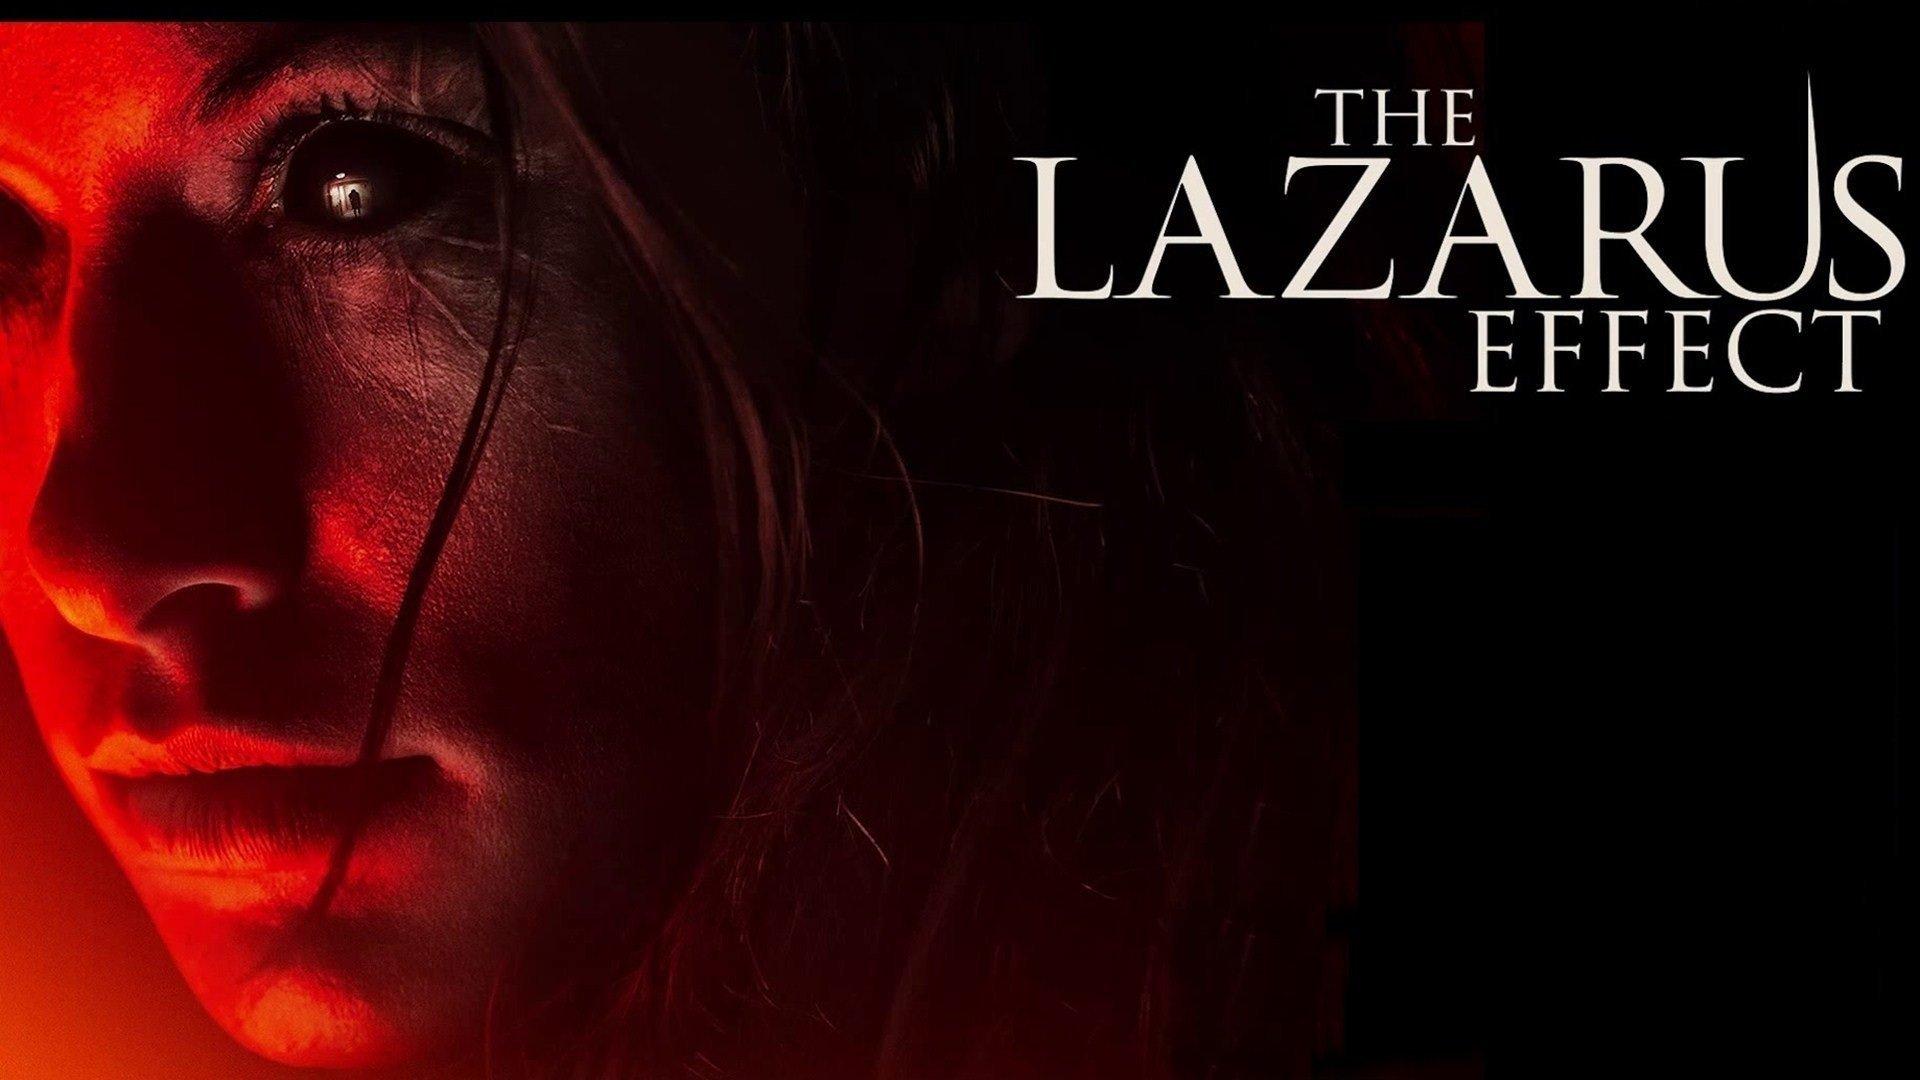 The Lazarus Effect Fondo De Pantalla Hd Fondo De